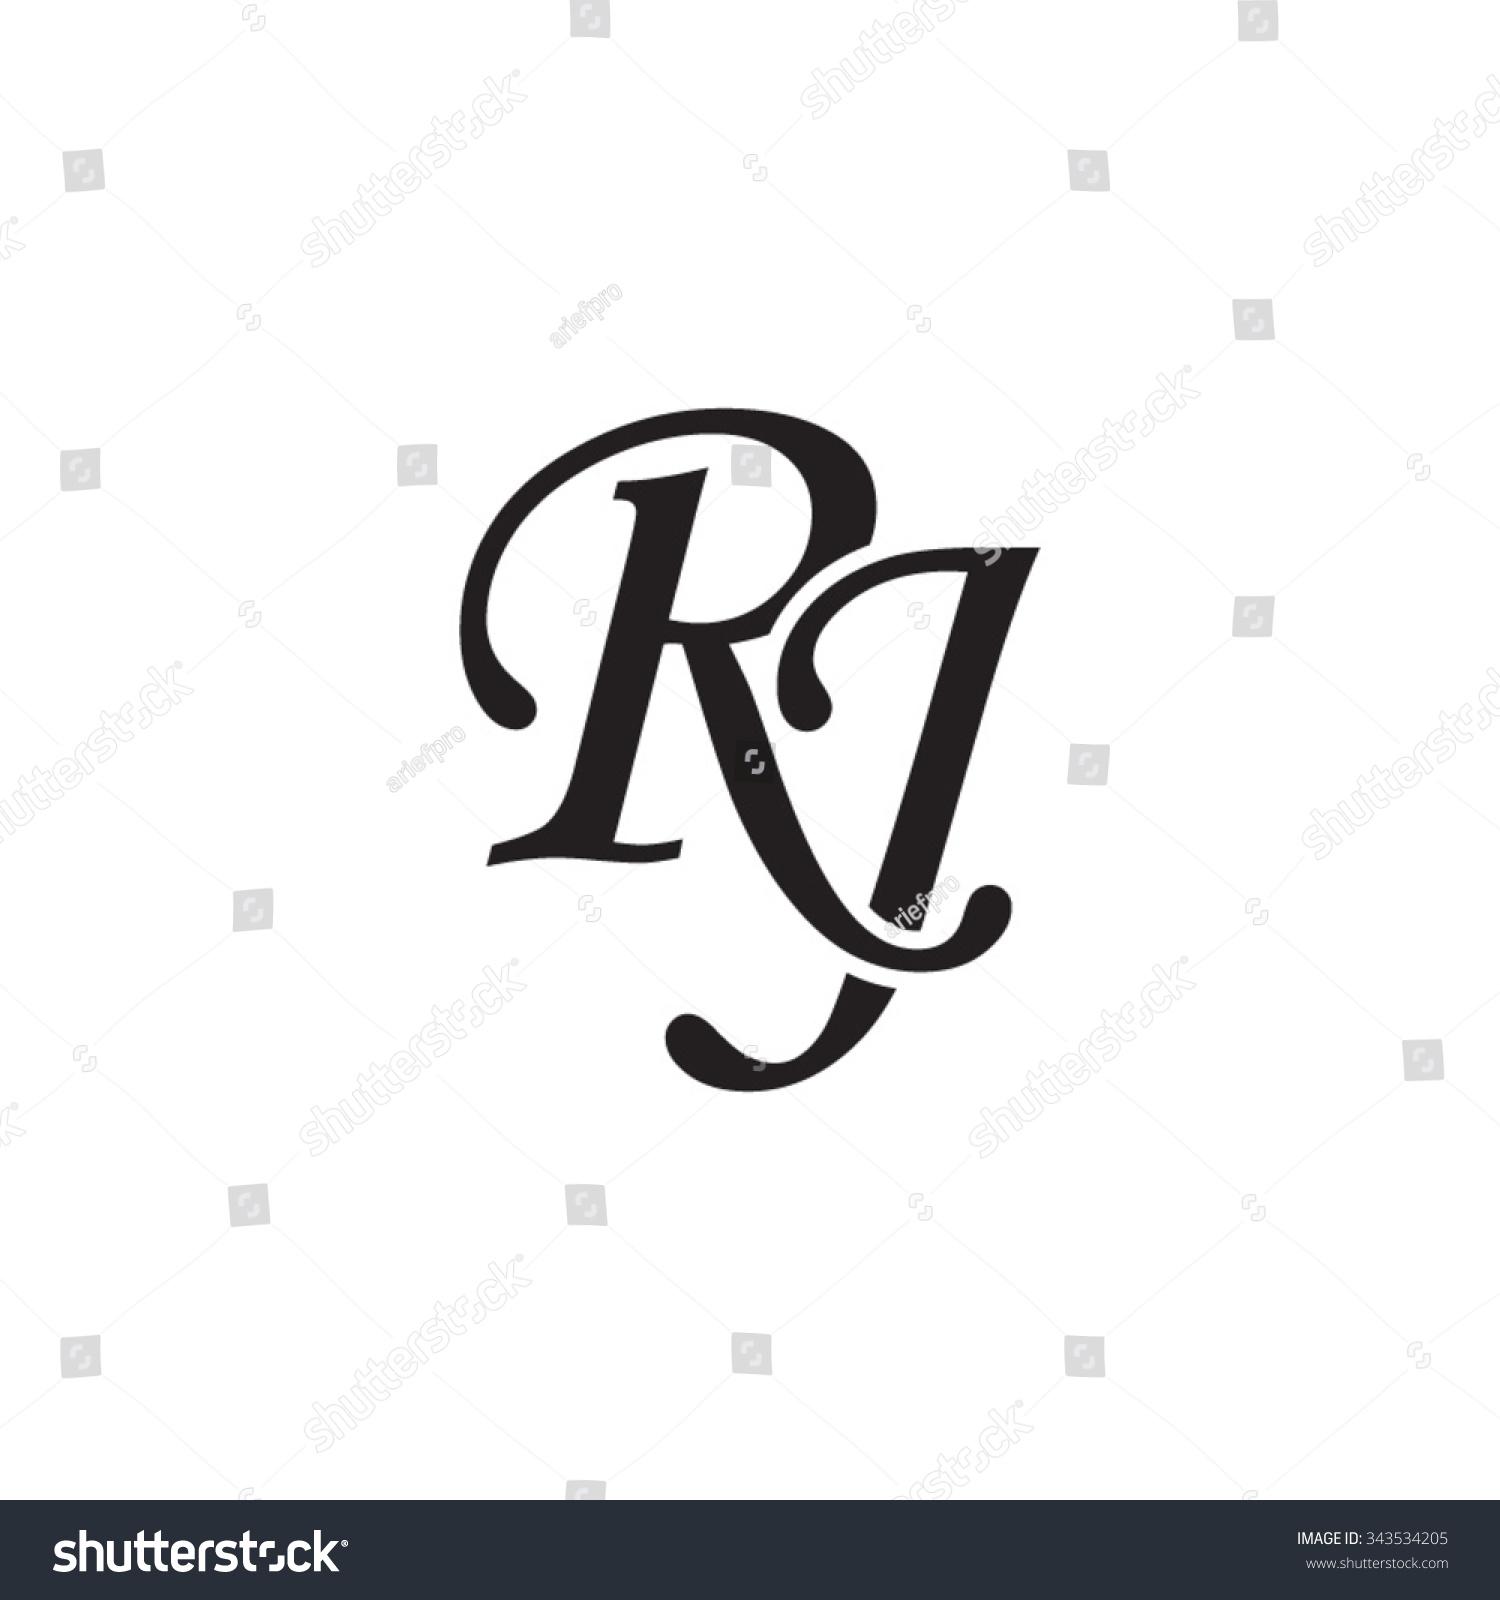 The Shelter Pics For Gt Rj Logo Images